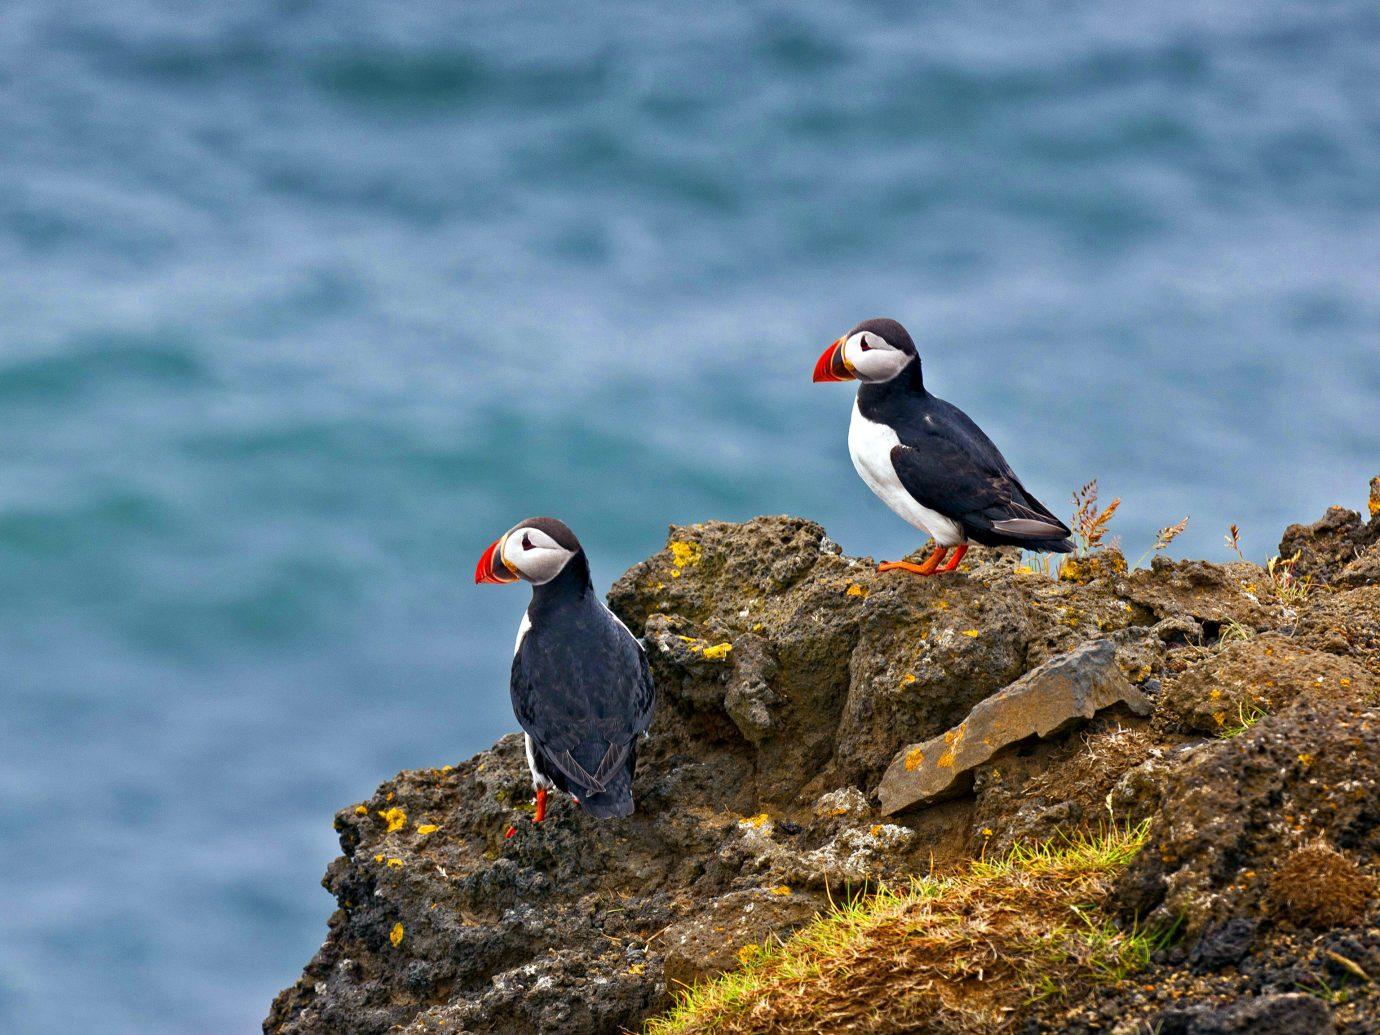 Travel Tips Bird outdoor water puffin animal beak vertebrate fauna Wildlife rock Sea charadriiformes seabird Ocean Coast